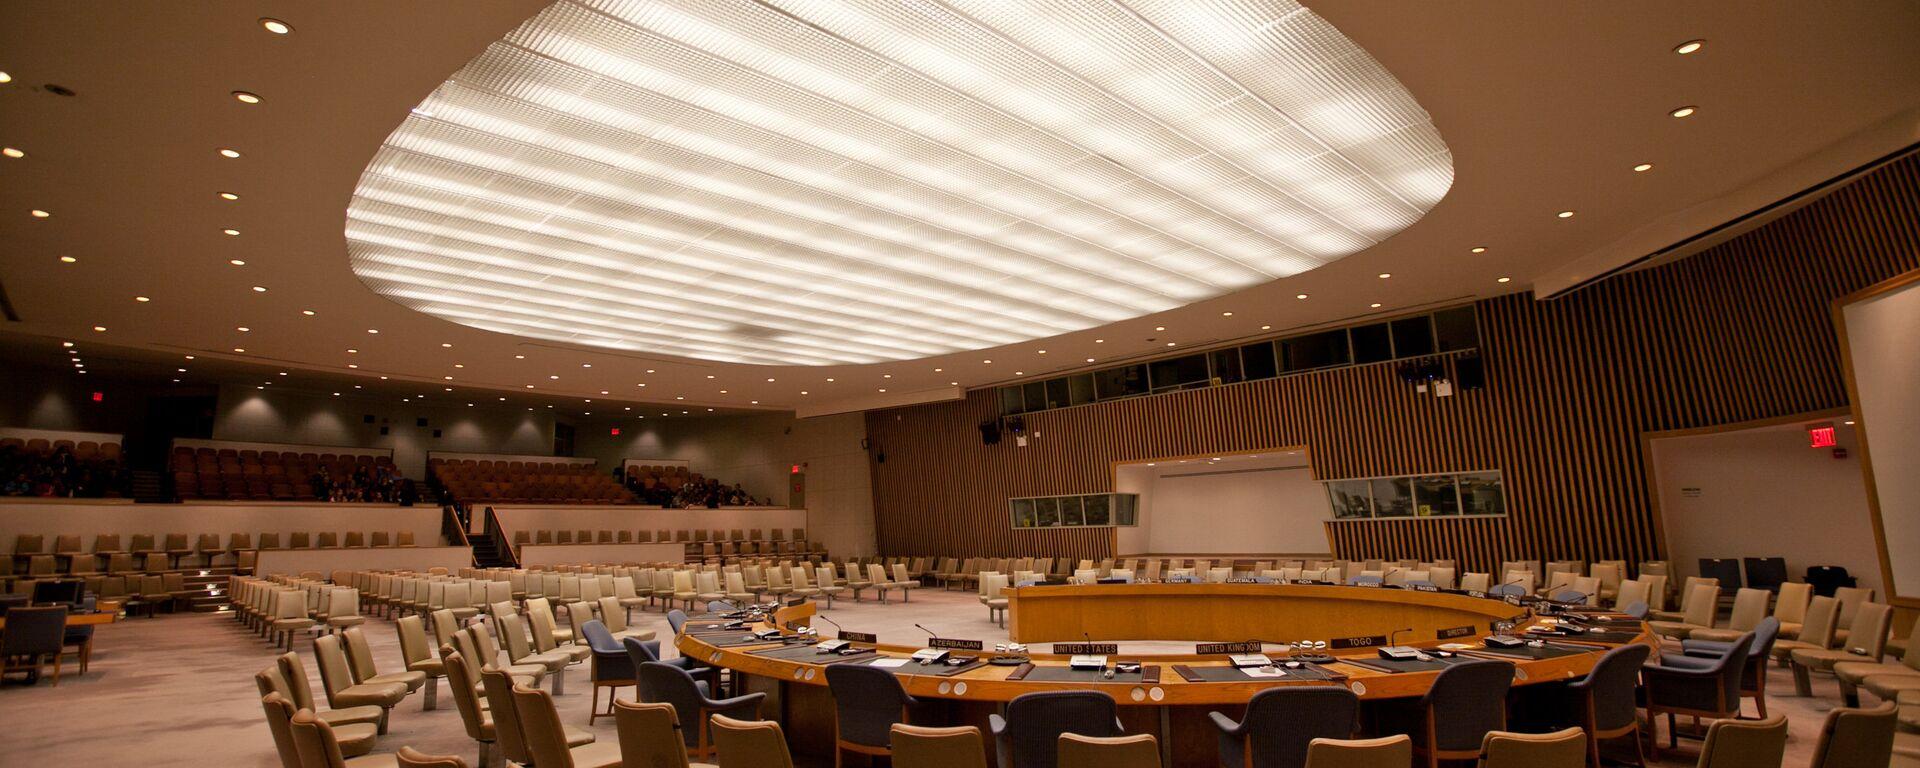 UN Security Council chamber (File photo). - Sputnik International, 1920